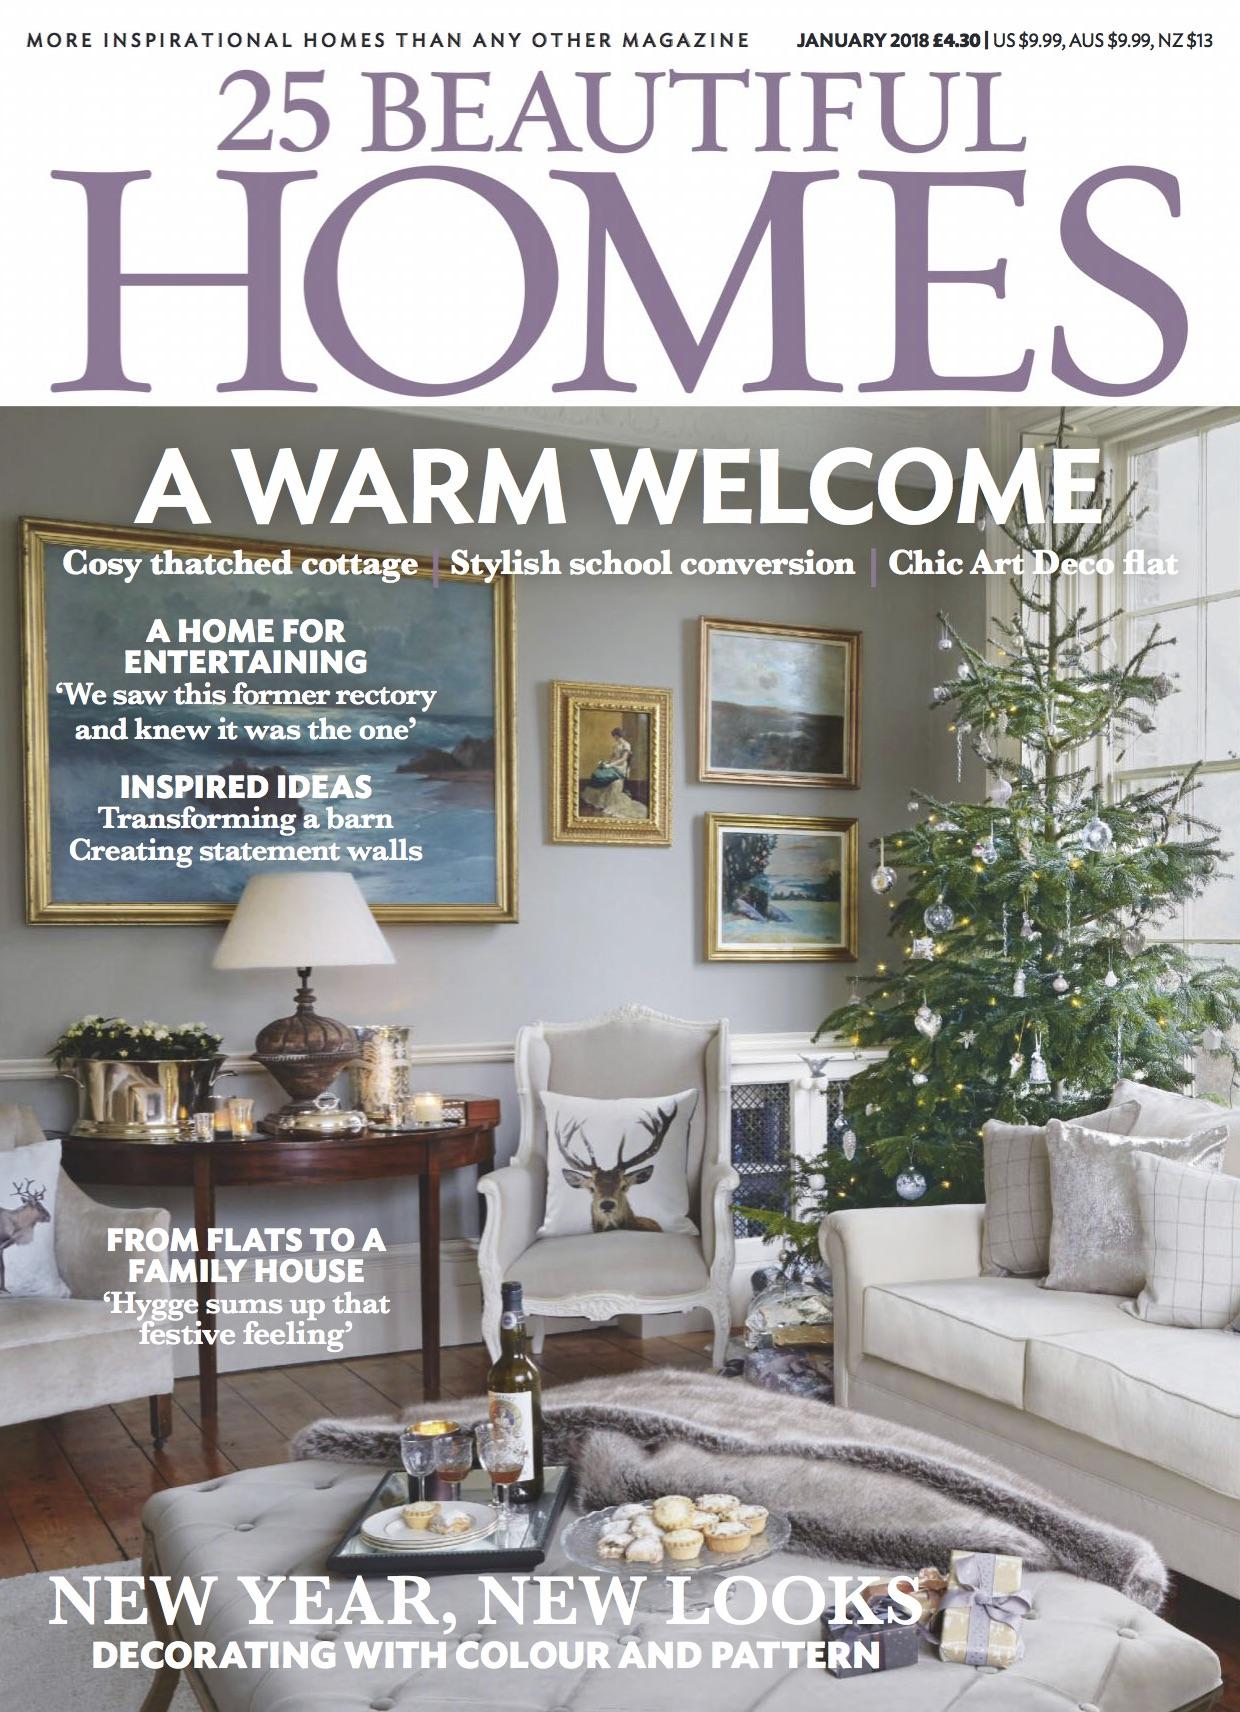 A four page tour around Diane's home, Jan 2018